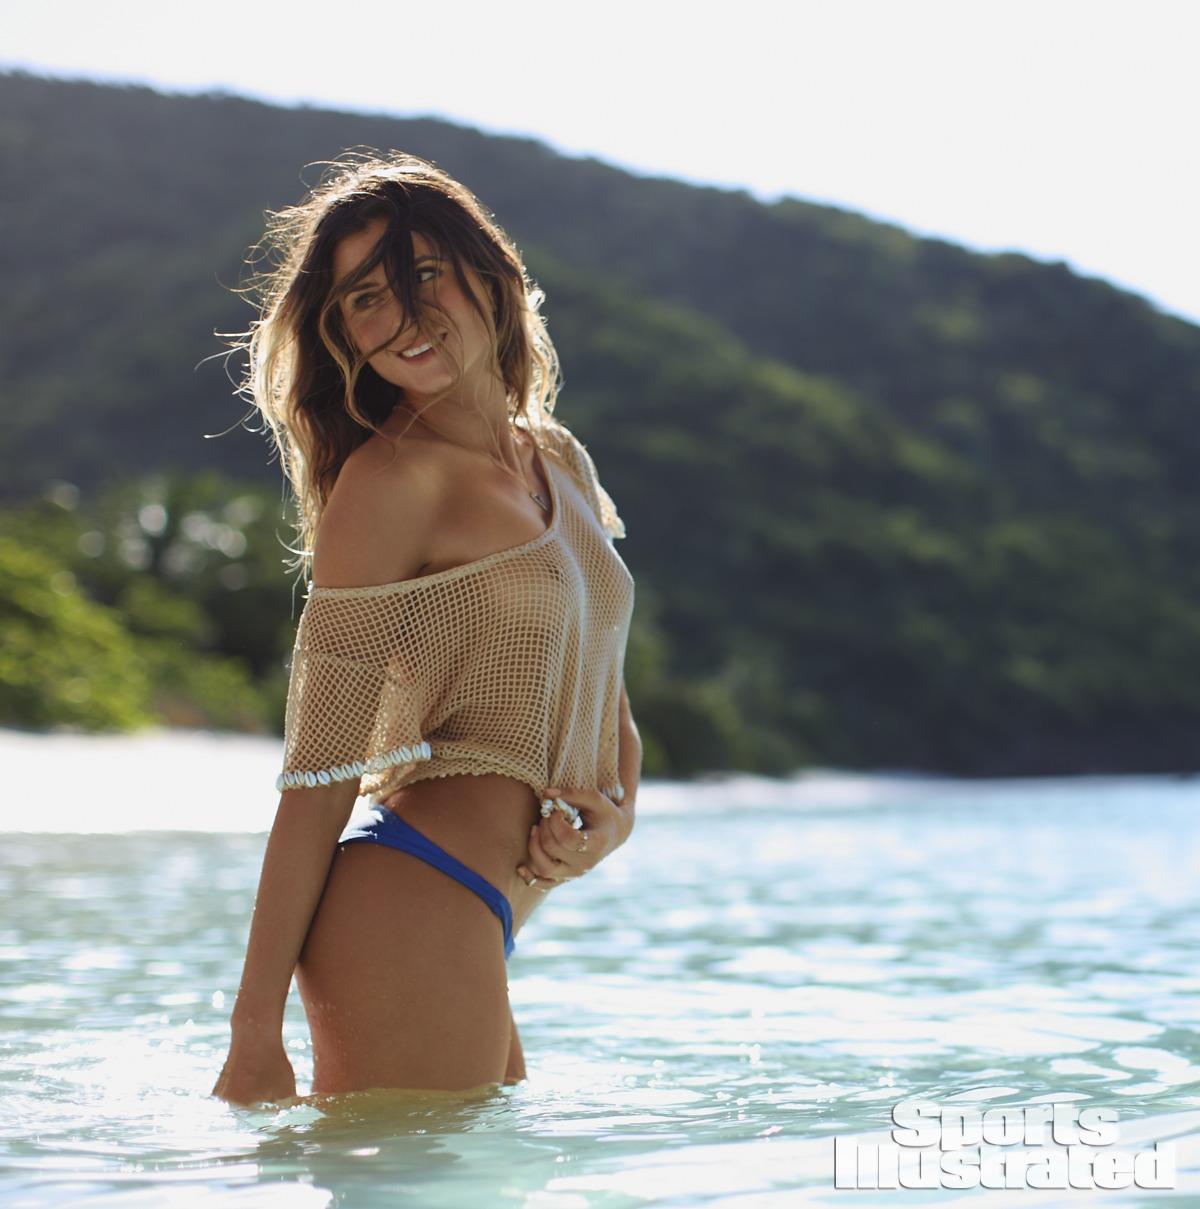 Anastasia Ashley 2014 Swimsuit: Guana Island | SI.com